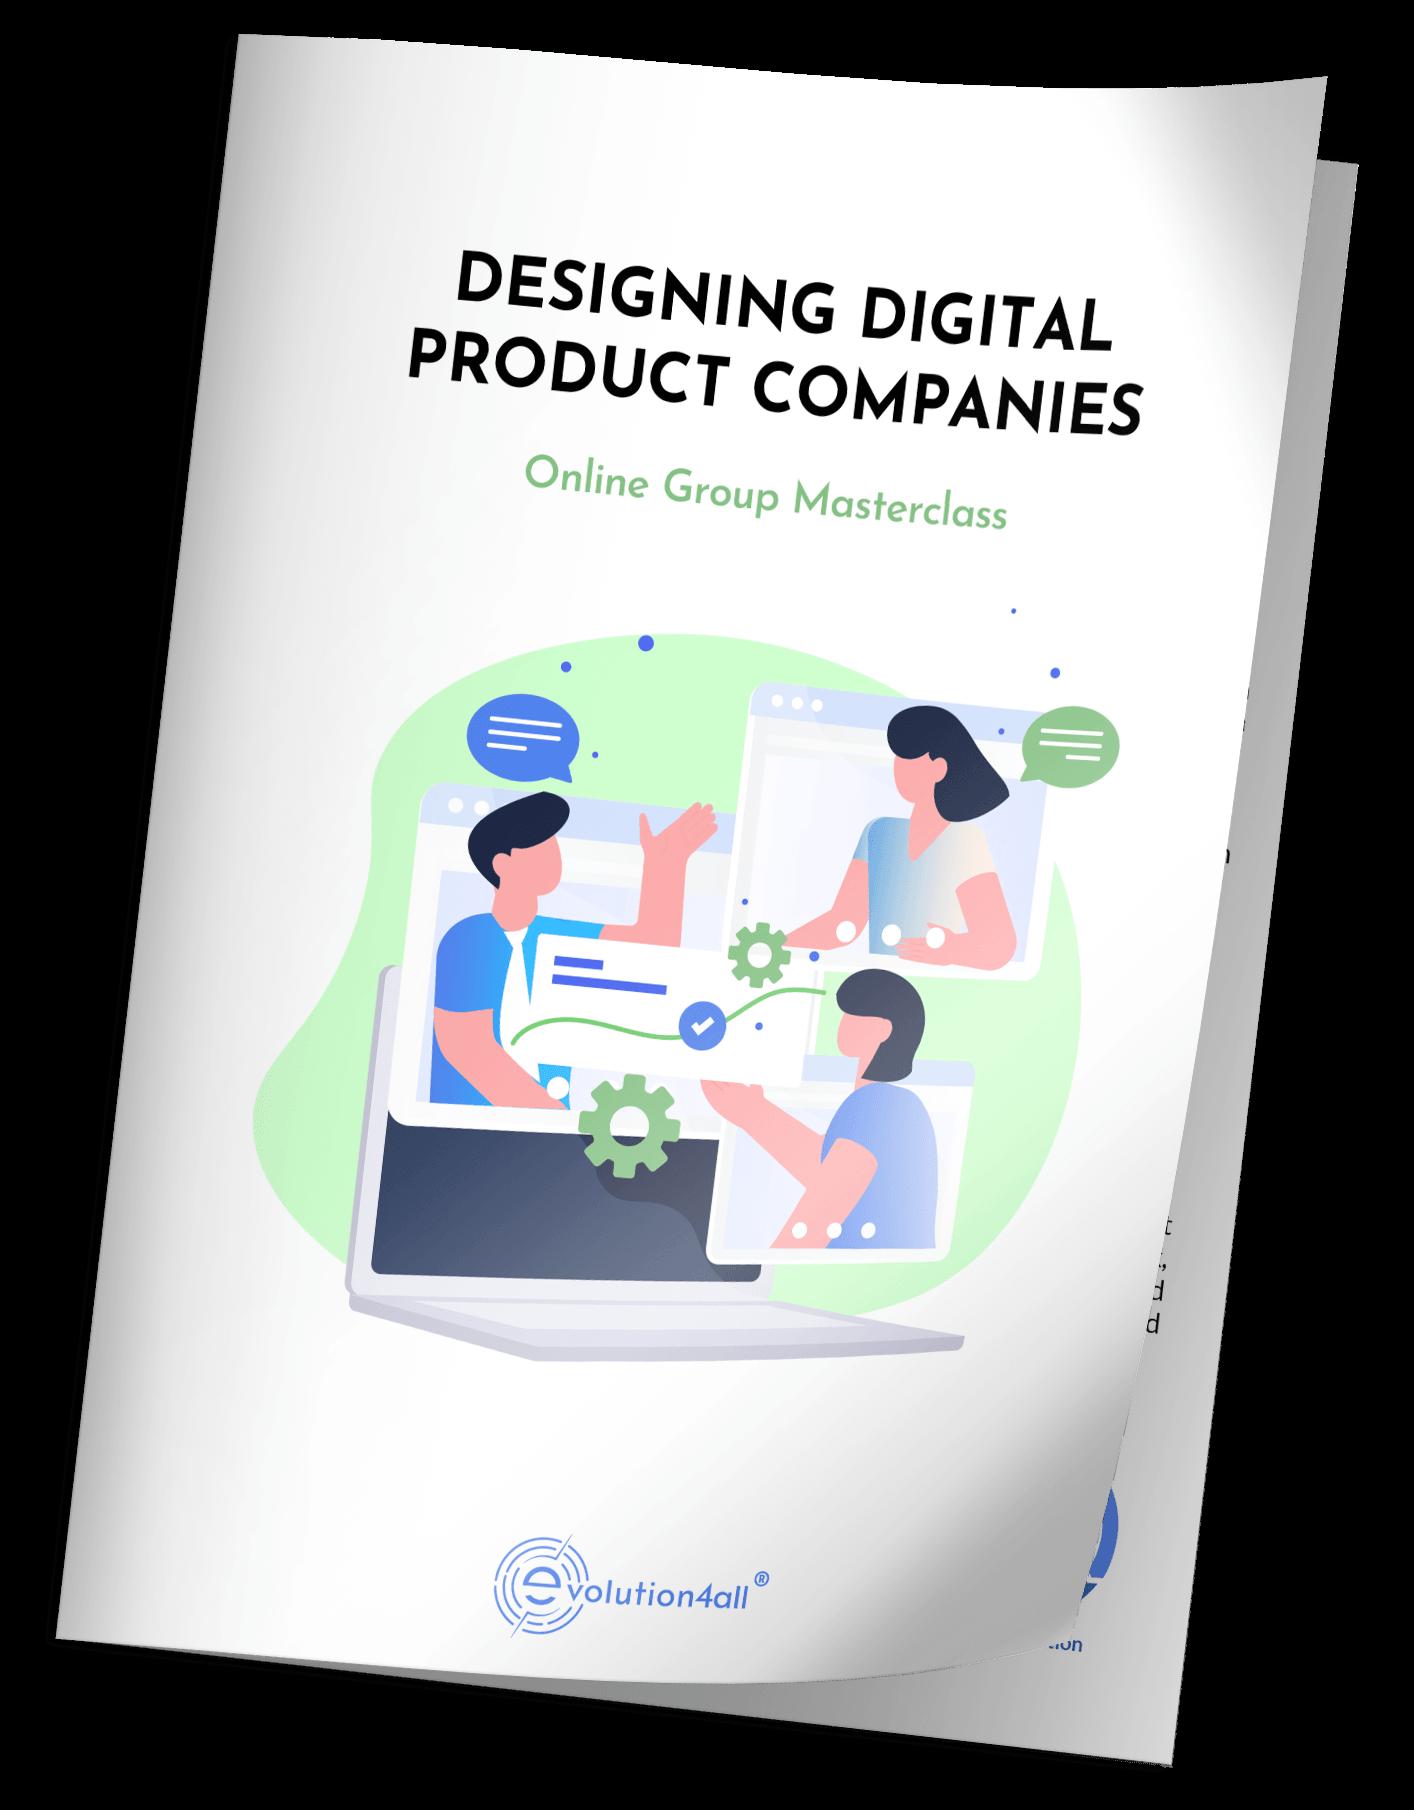 FREE WORKSHOP FOR EXECUTIVES OF SM Businesses: DESIGNING A DIGITAL PRODUCT ORGANISATION